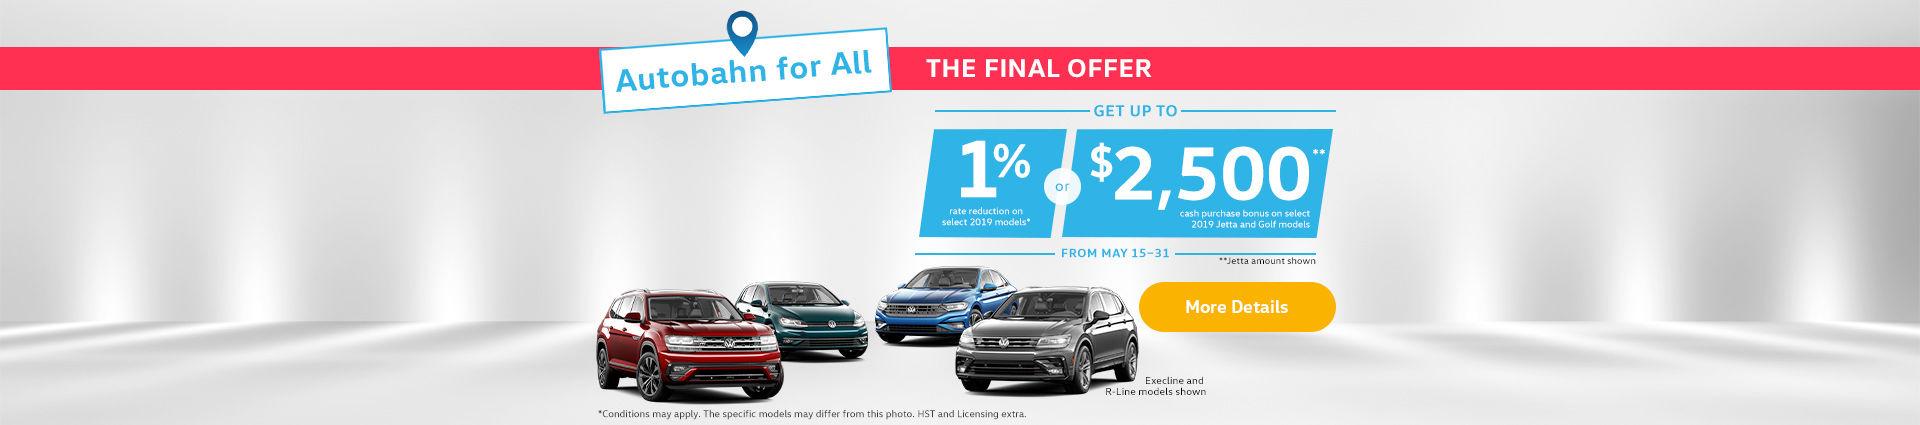 Volkswagen Autobahn Sales Event short sale